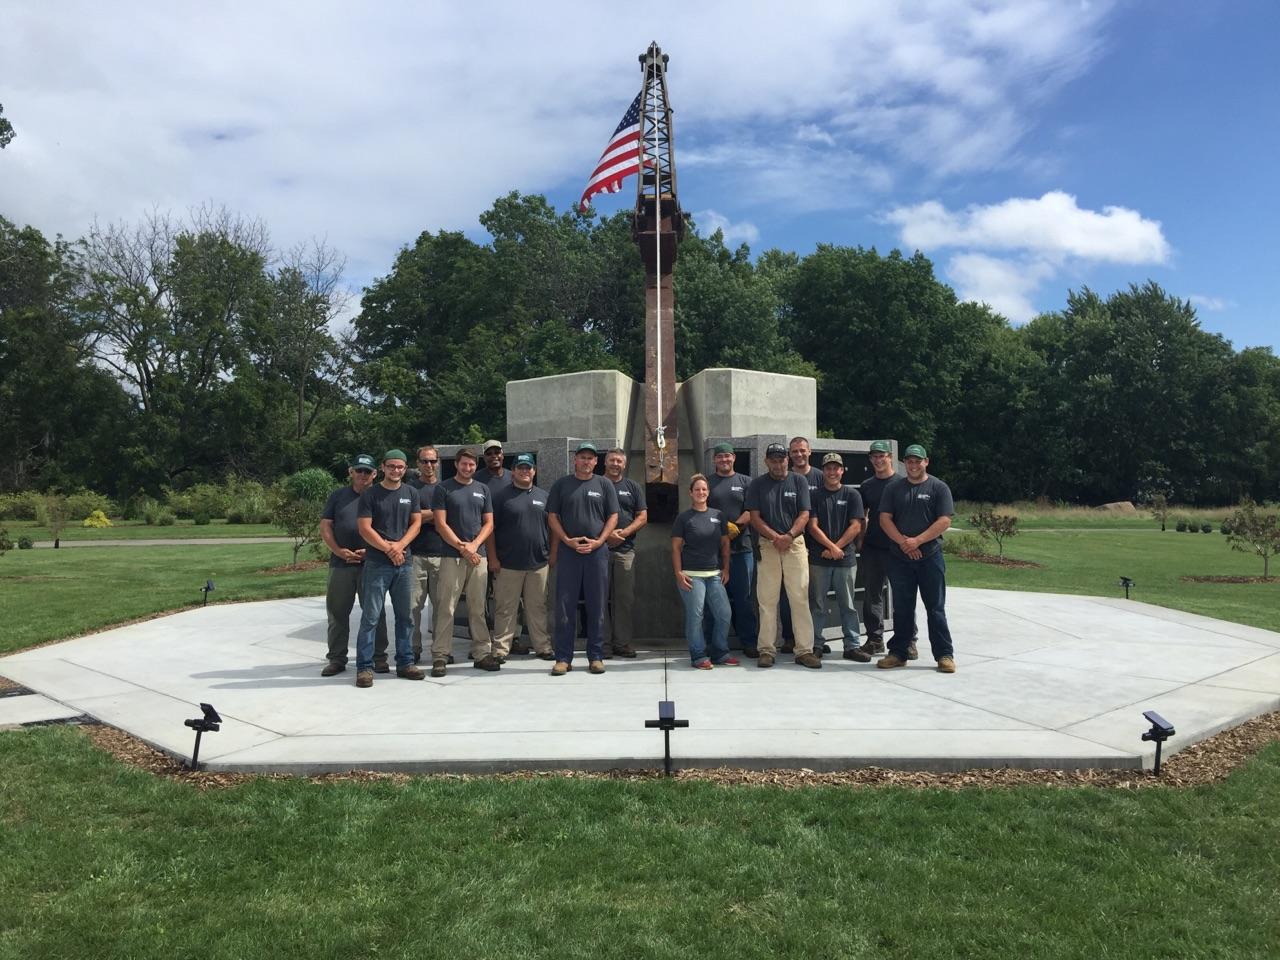 Toledo Memorial Park Ground's Crew - day of dedication September 10th, 2016